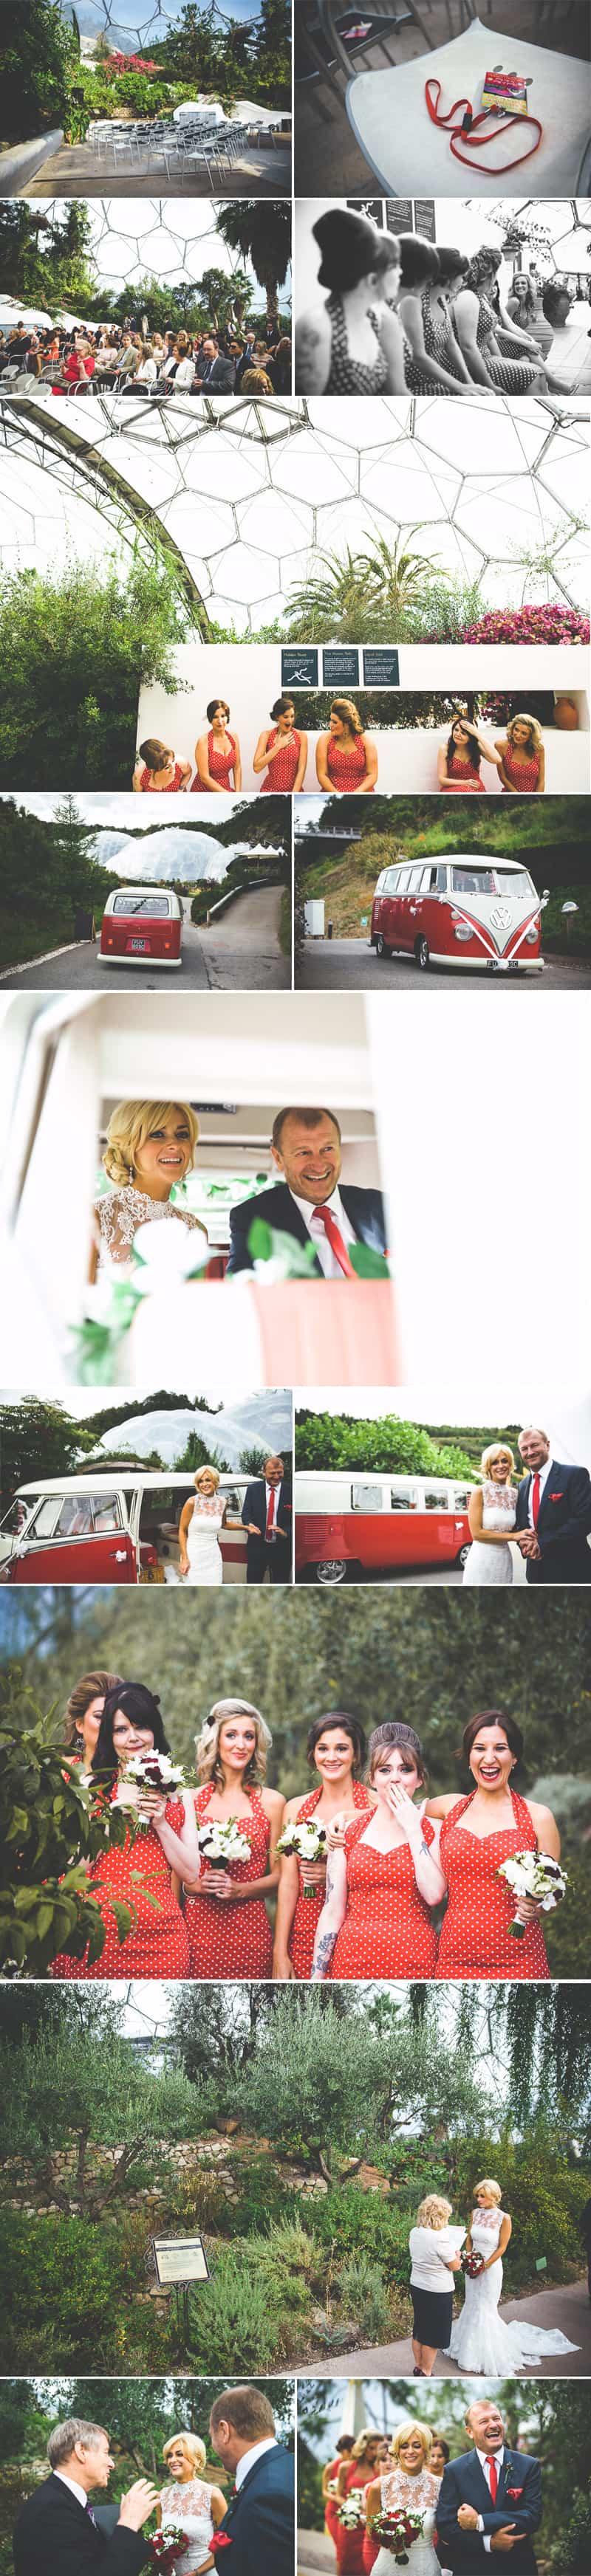 Glastonbury Eden Project Wedding Zip Lining Festival Themed 2